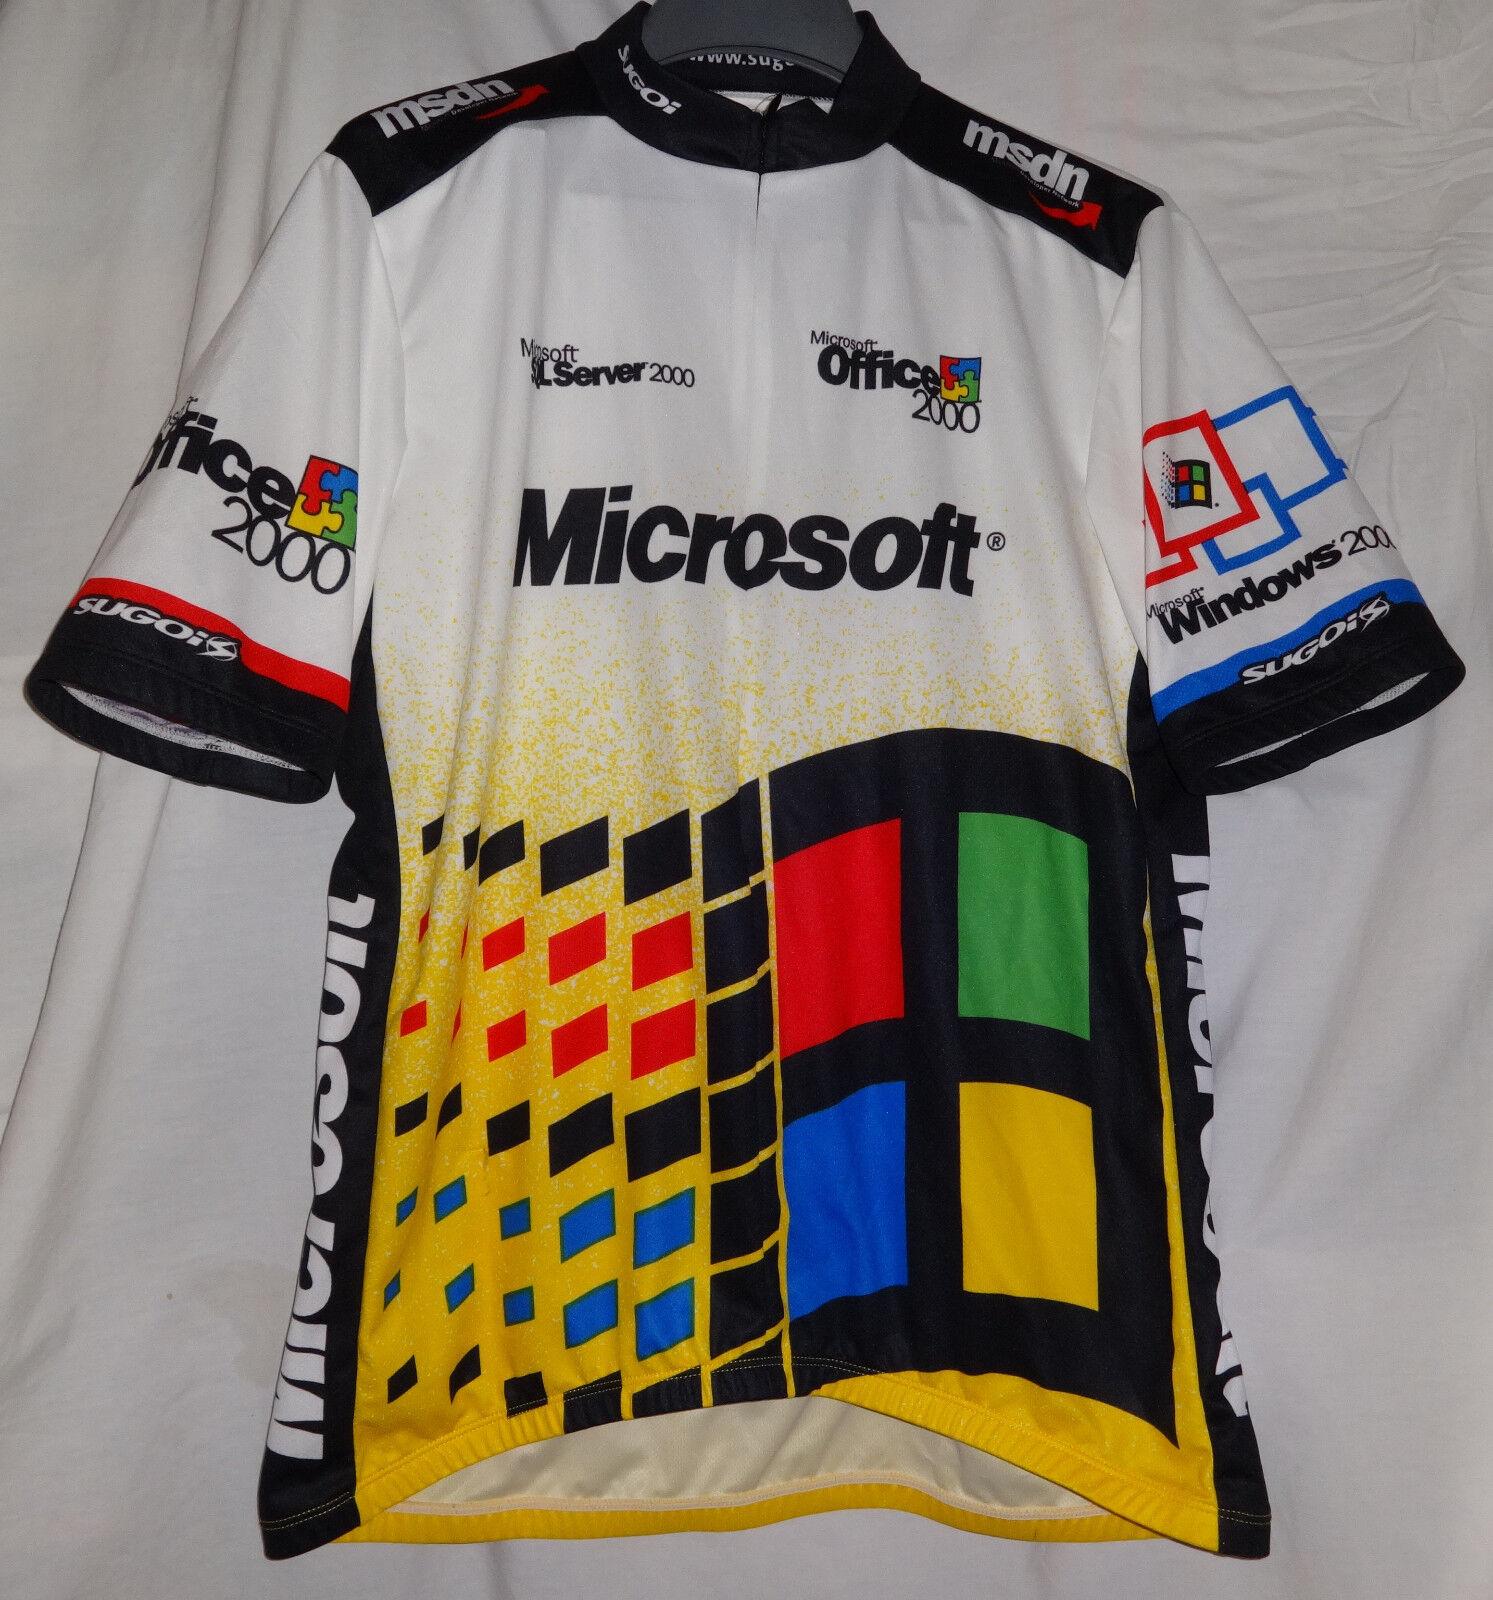 Microsoft Windows Office Server Visual Studio PROMO Cycling Bike  Race Jersey L  limited edition